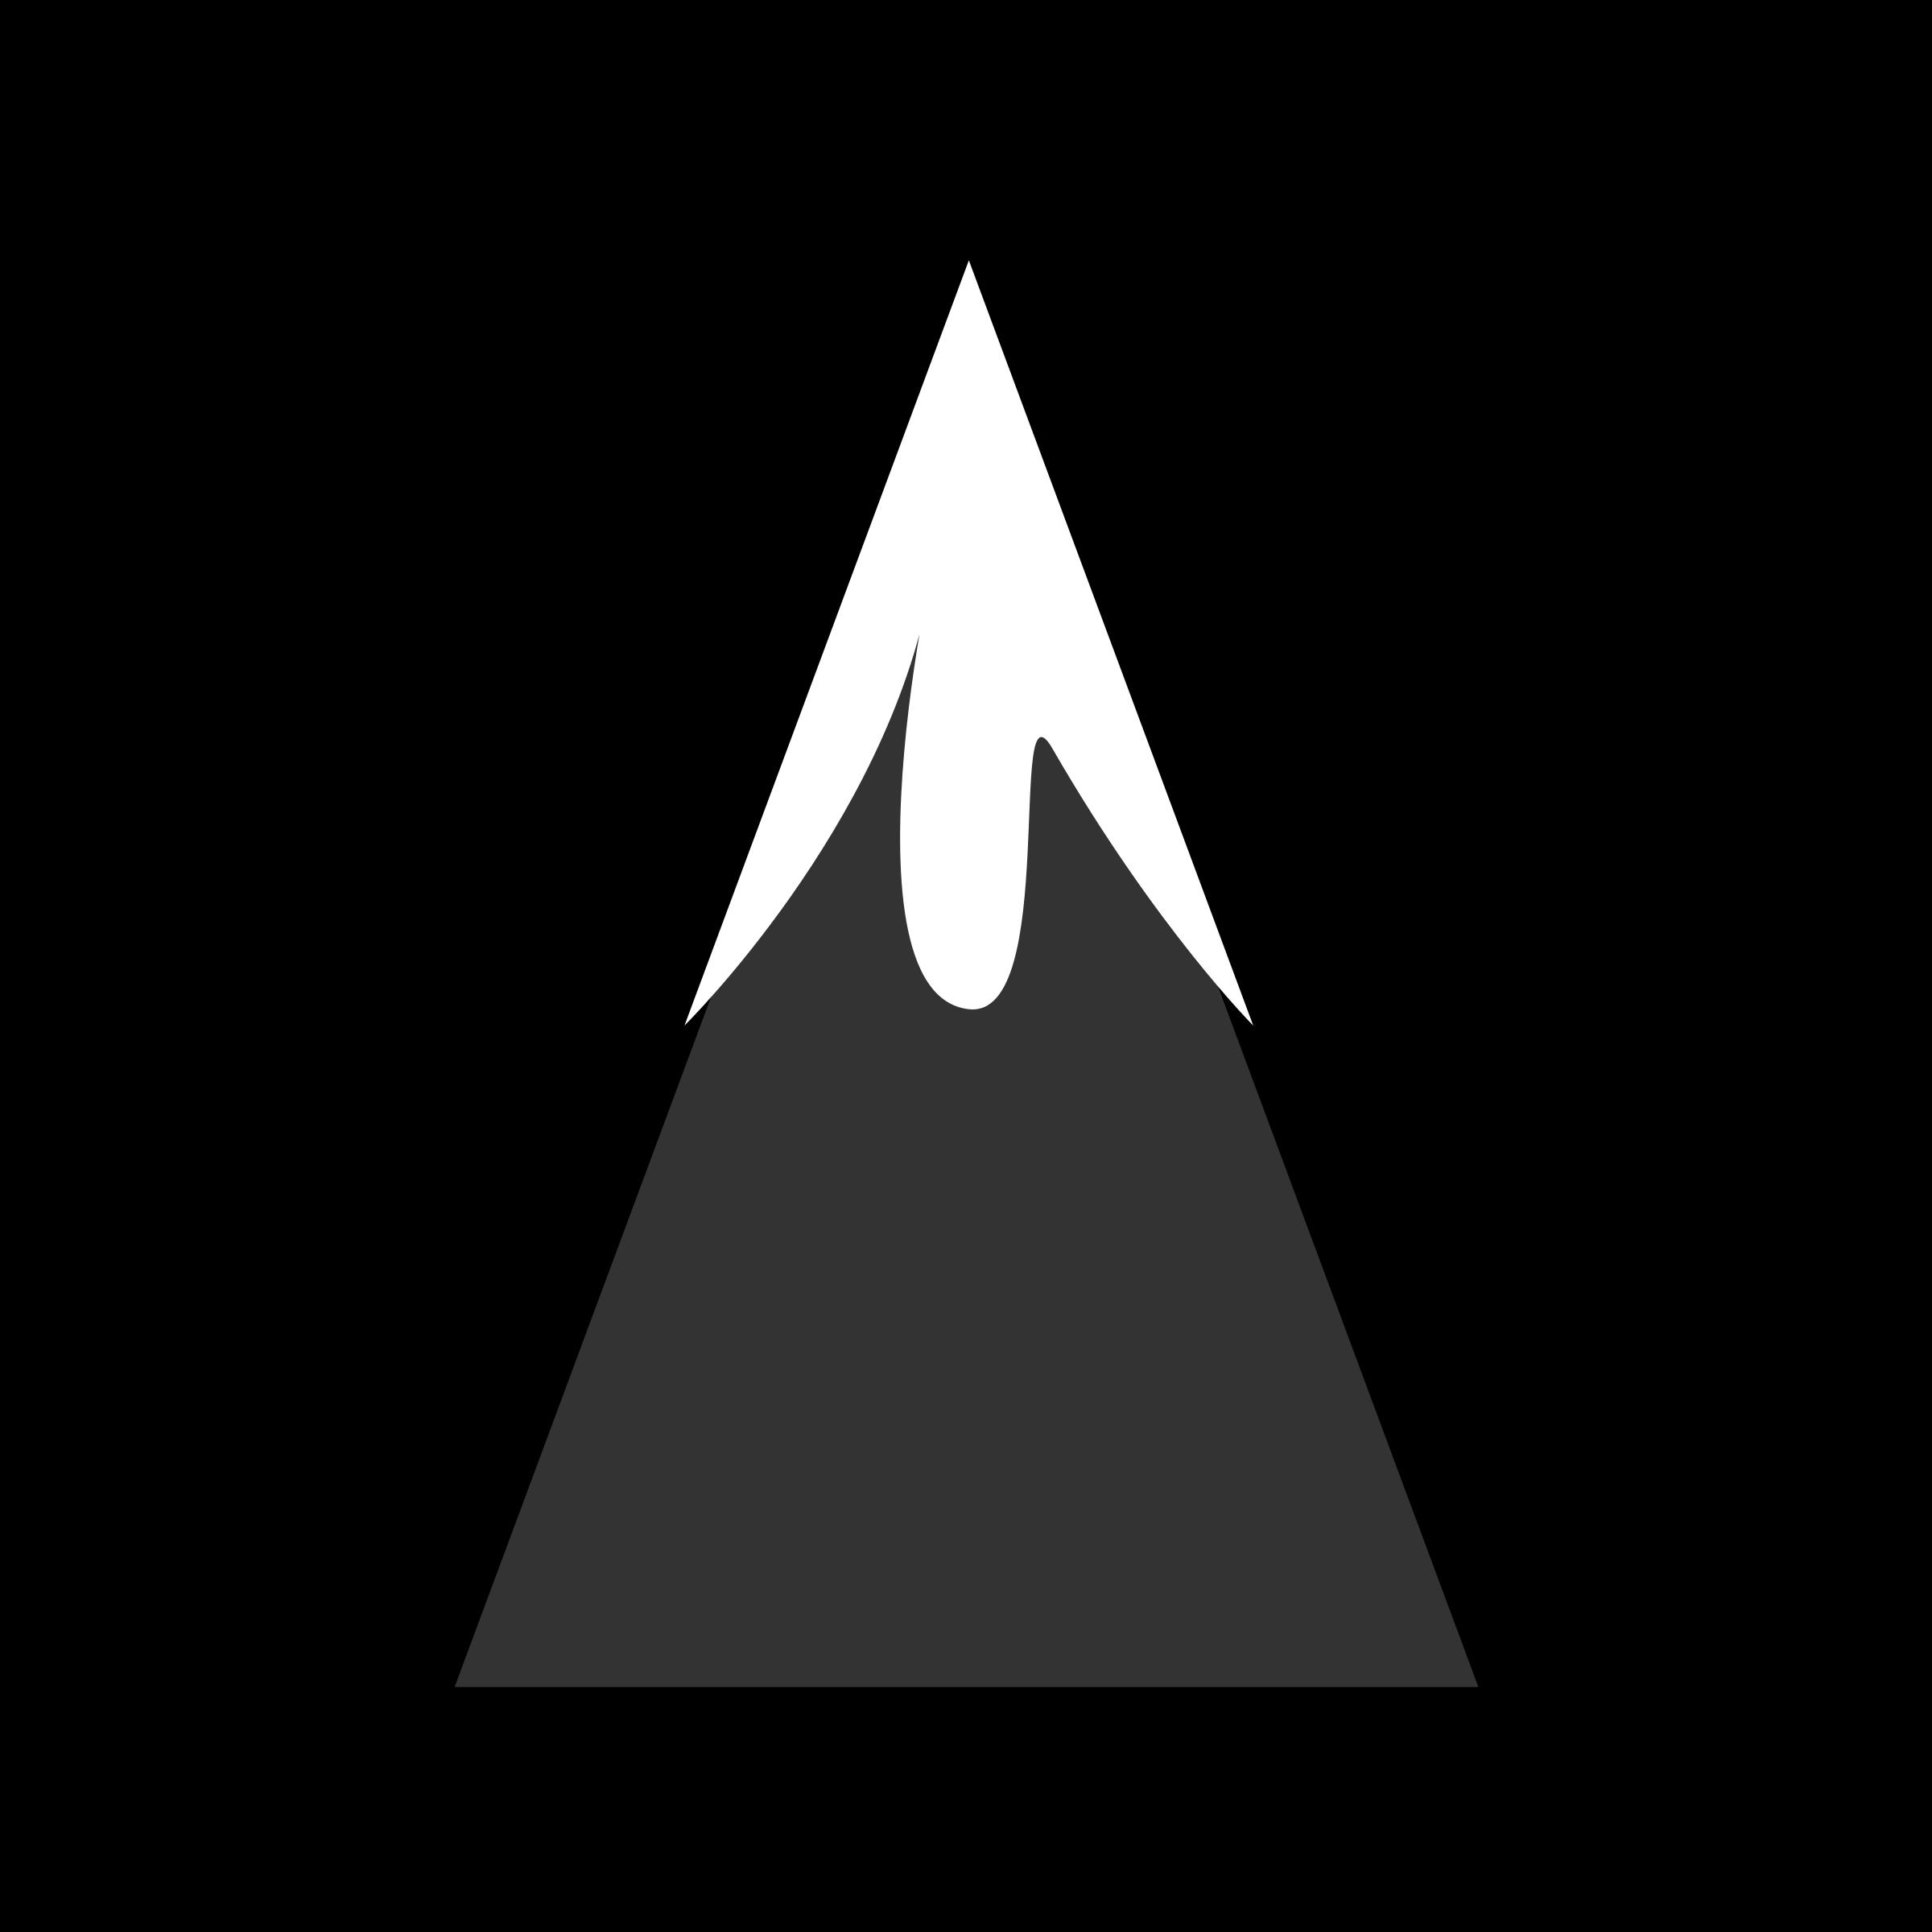 table mountain vector free mountain silhouette png download free clip art free mountain vector table